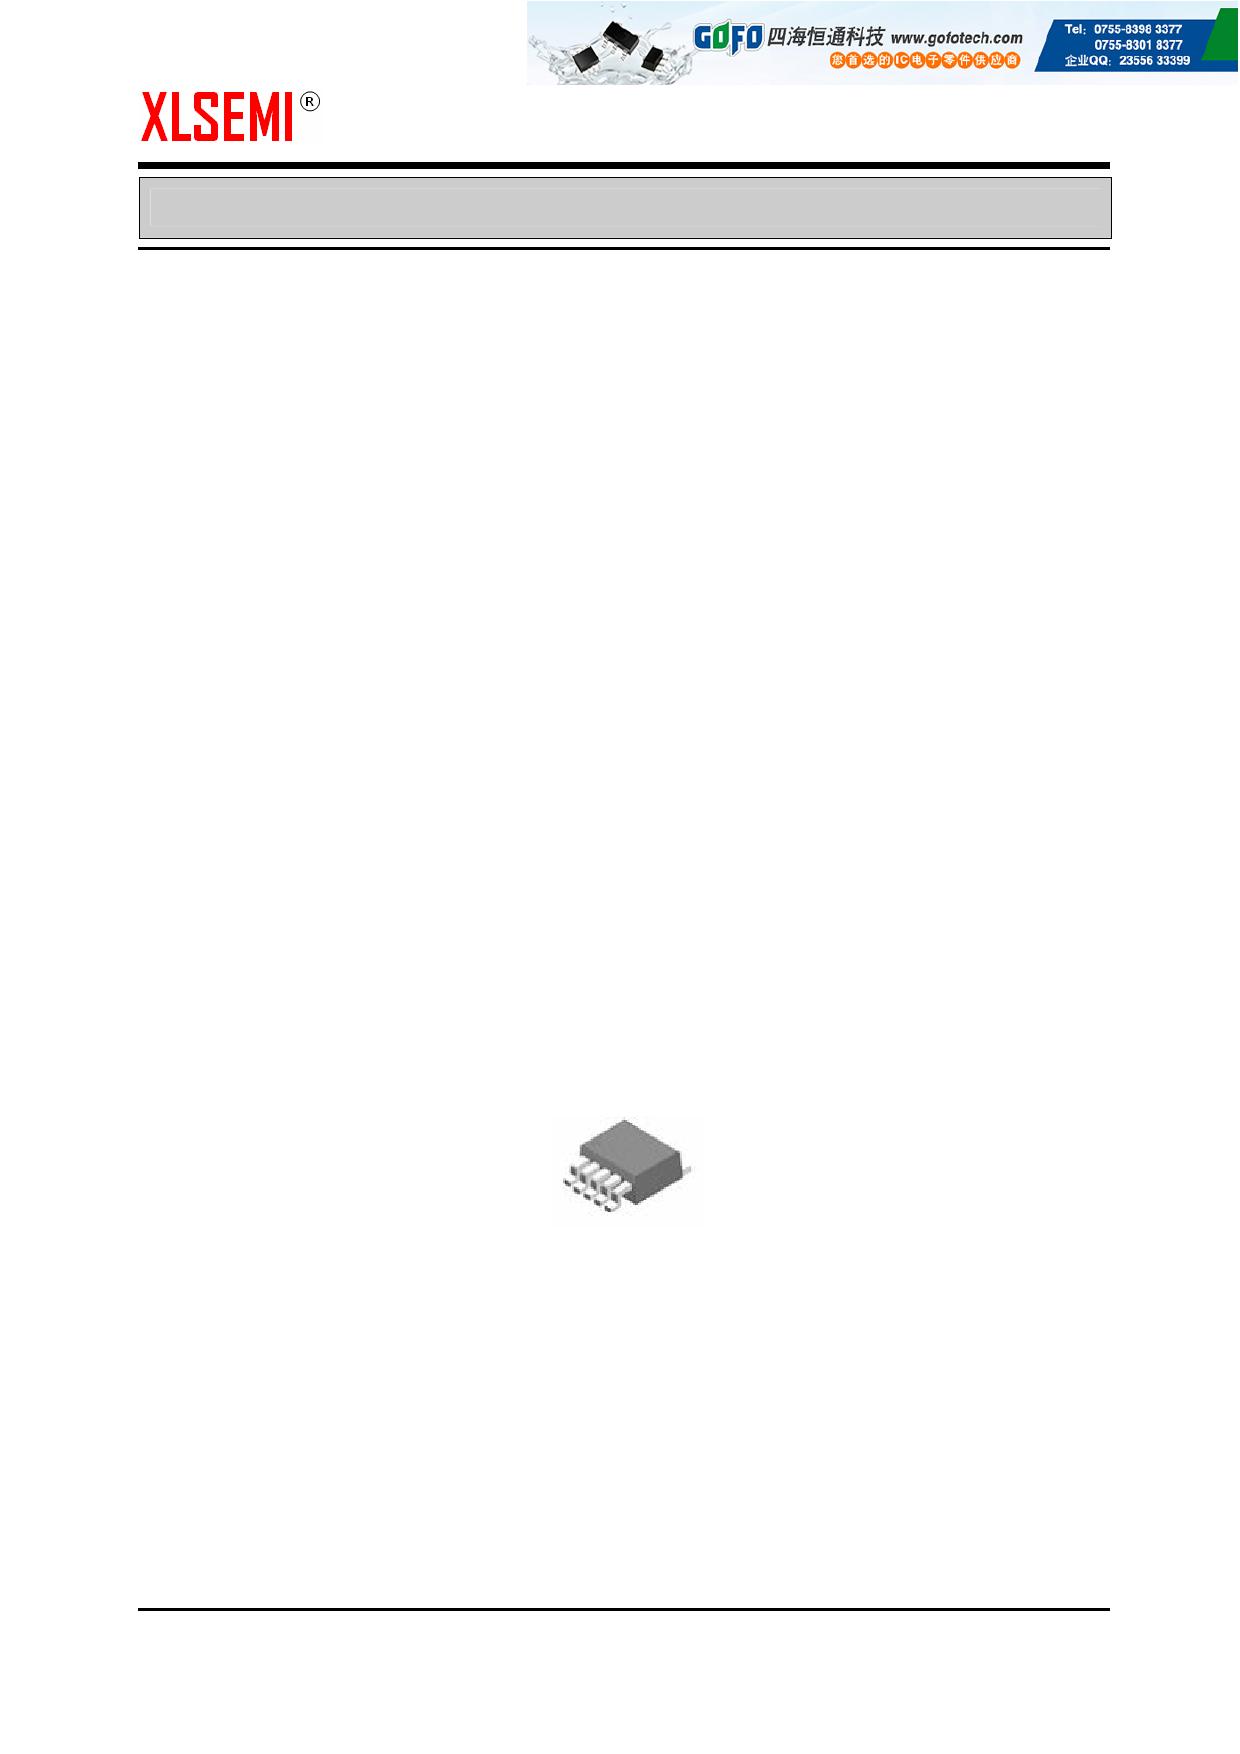 xl6004 datasheet pdf   pinout